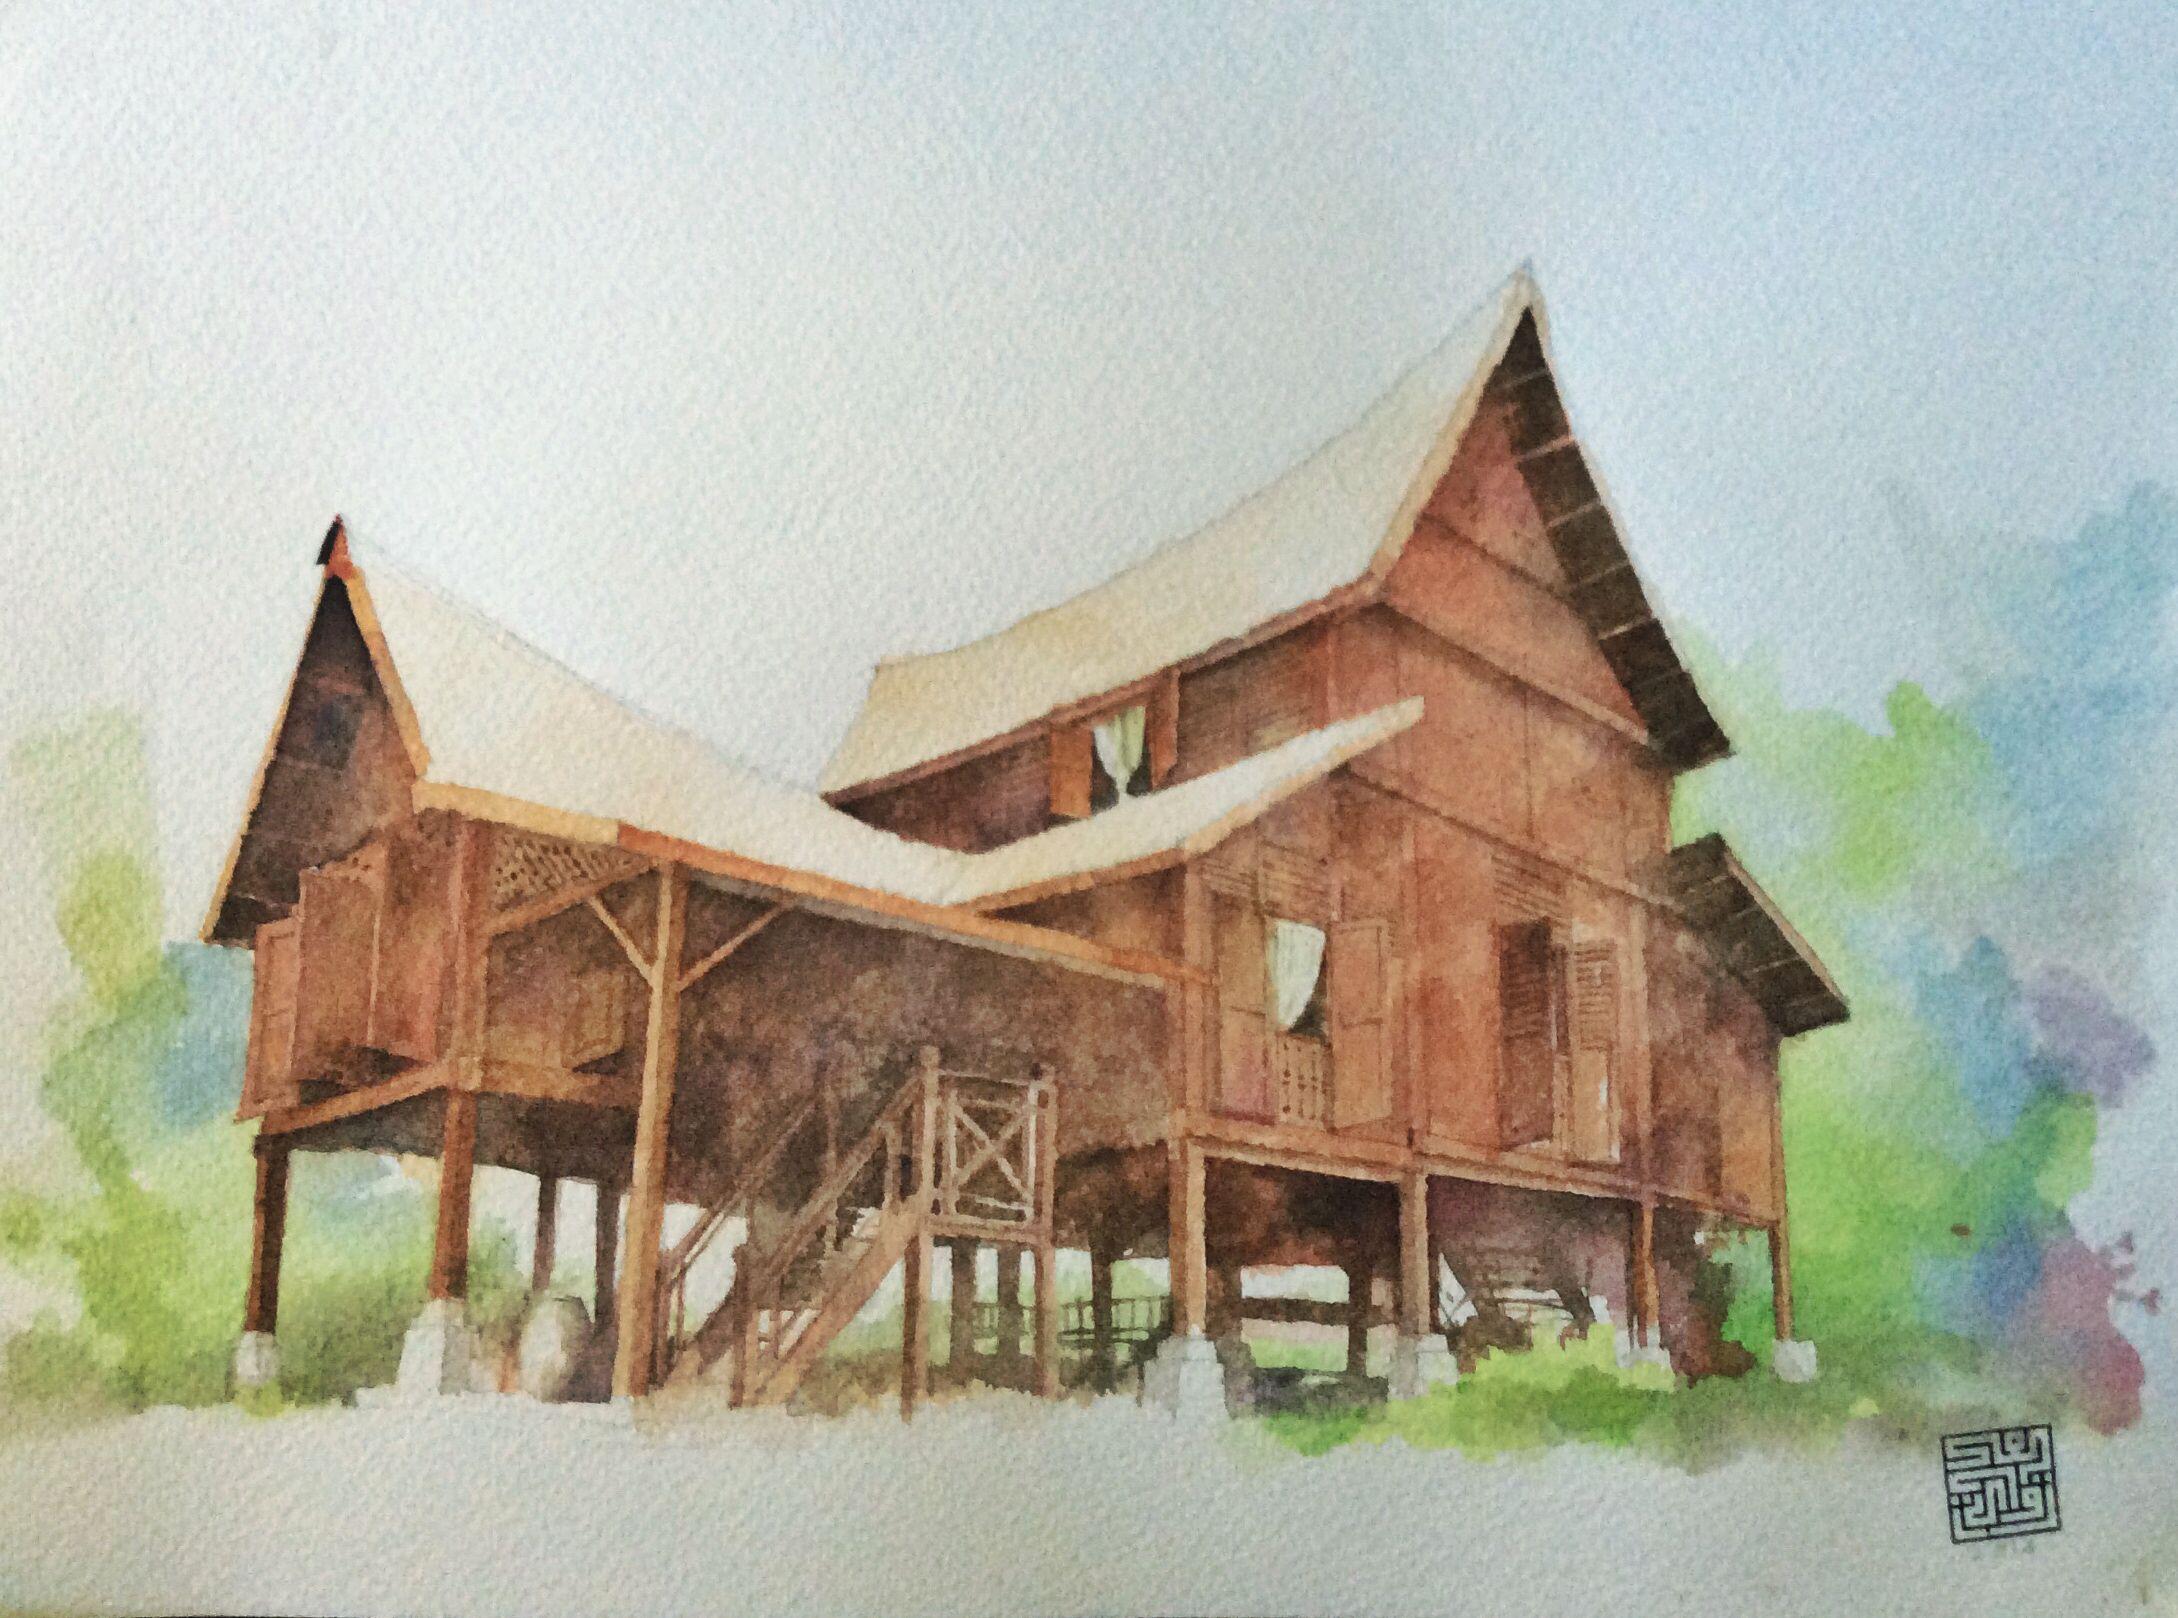 Malay traditional timber house watercolour architecture painting rumah negeri sembilan